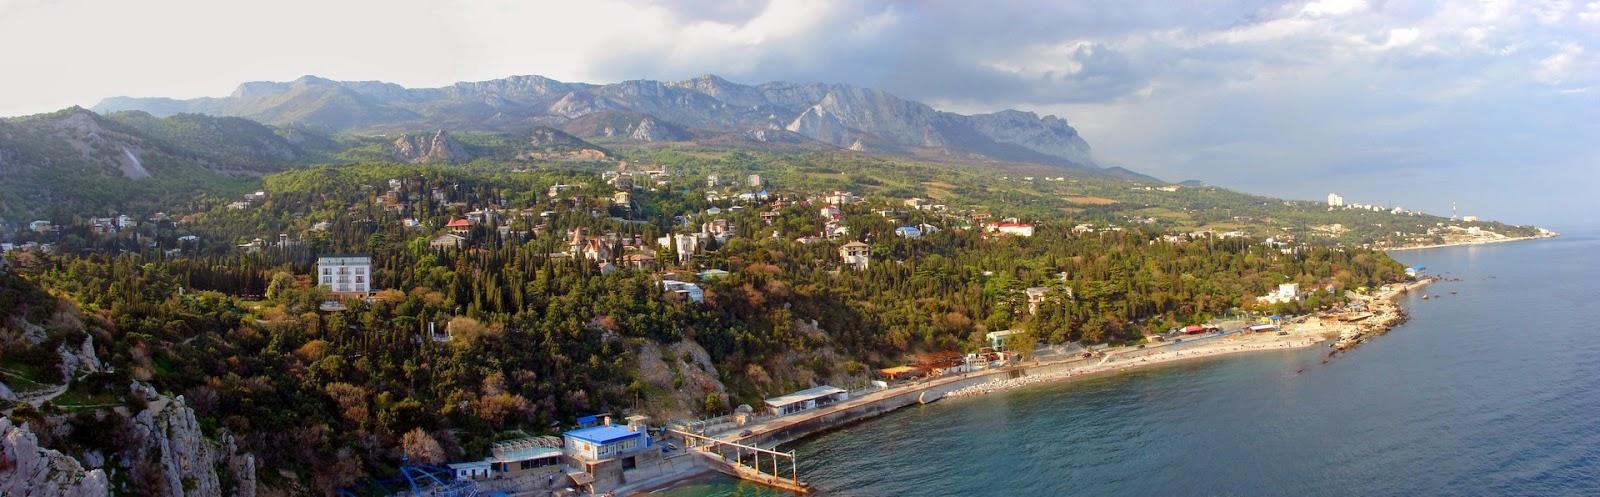 Вид на Симеиз и побережье со скалы Дива